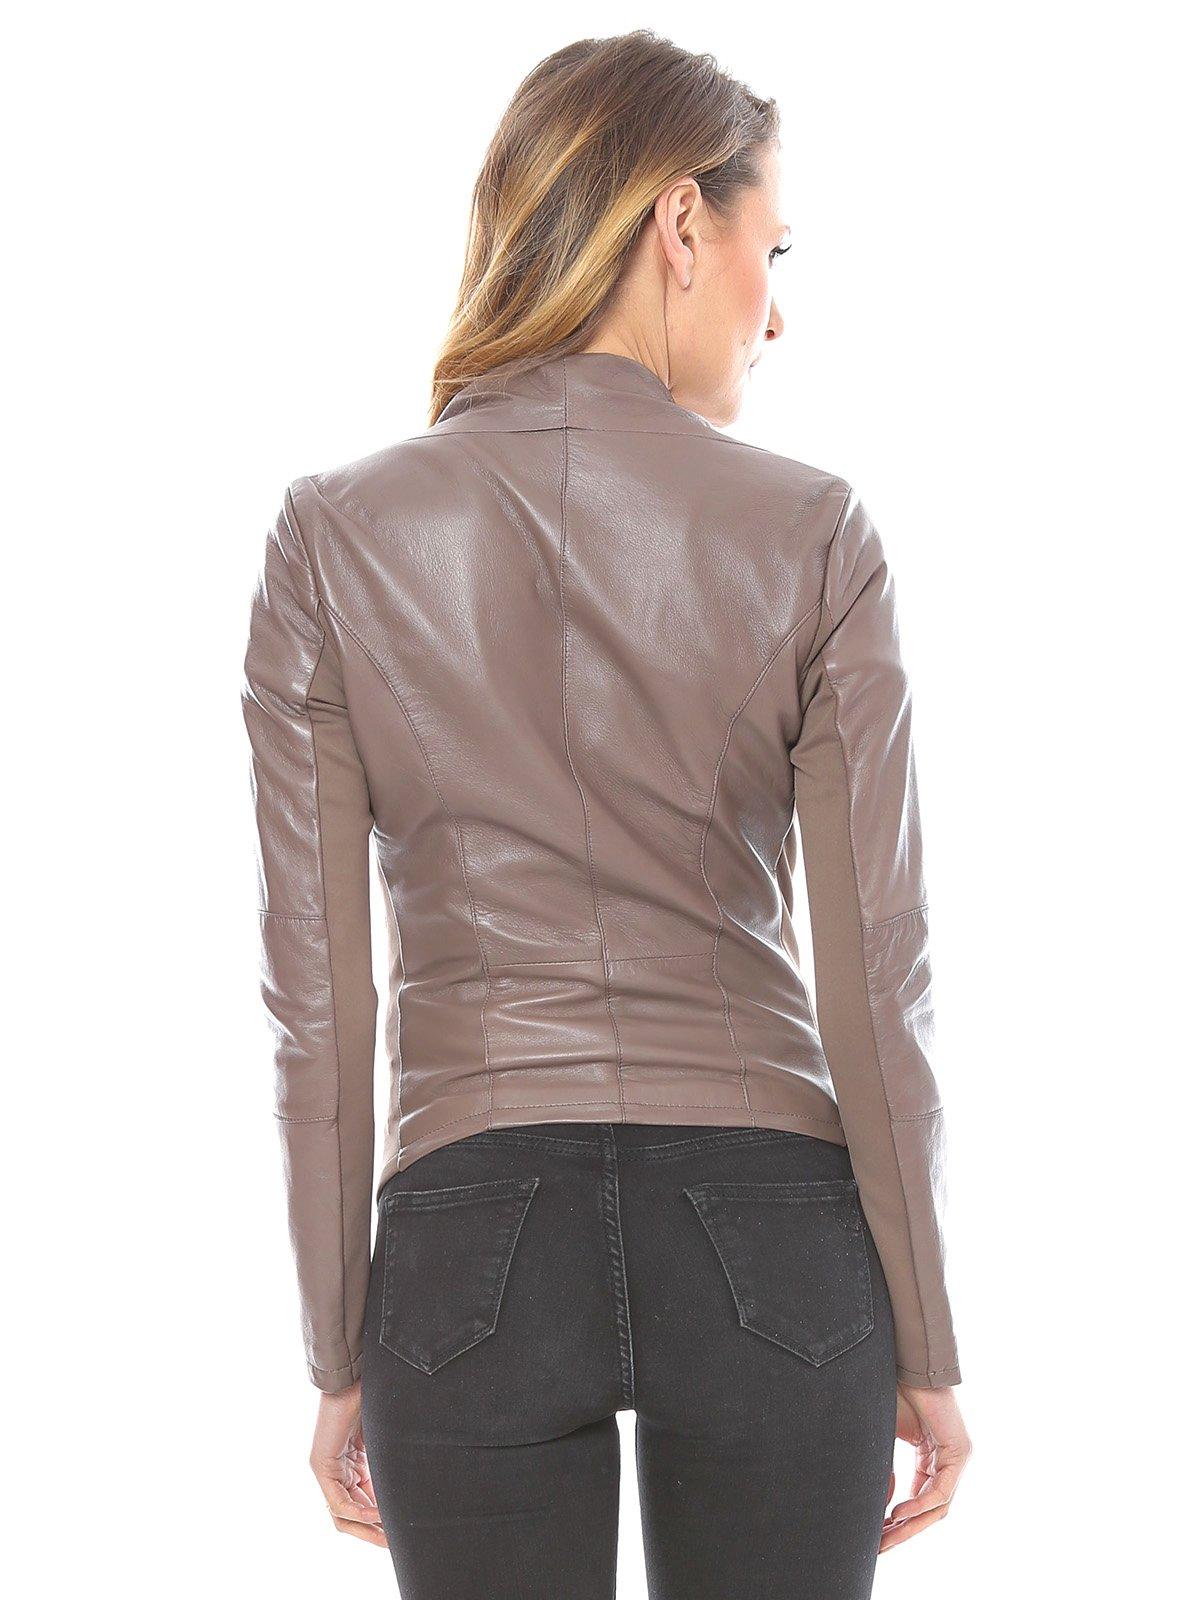 Куртка цвета фанго | 3010565 | фото 2